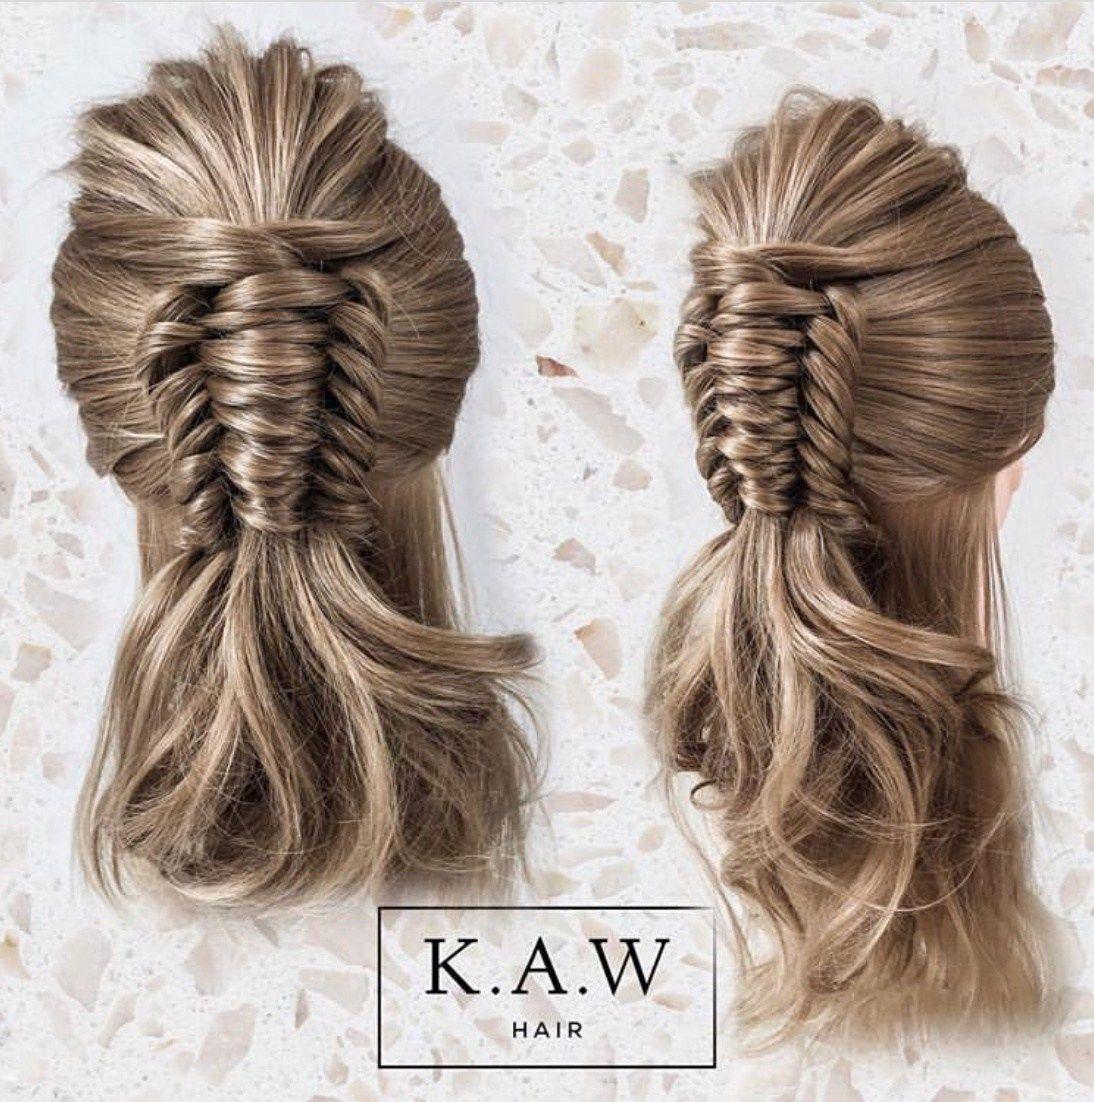 16 Simple Hair Braid Styles To Try The Wonder Cottage In 2020 Braid Styles Braided Hairstyles Easy Hairstyles